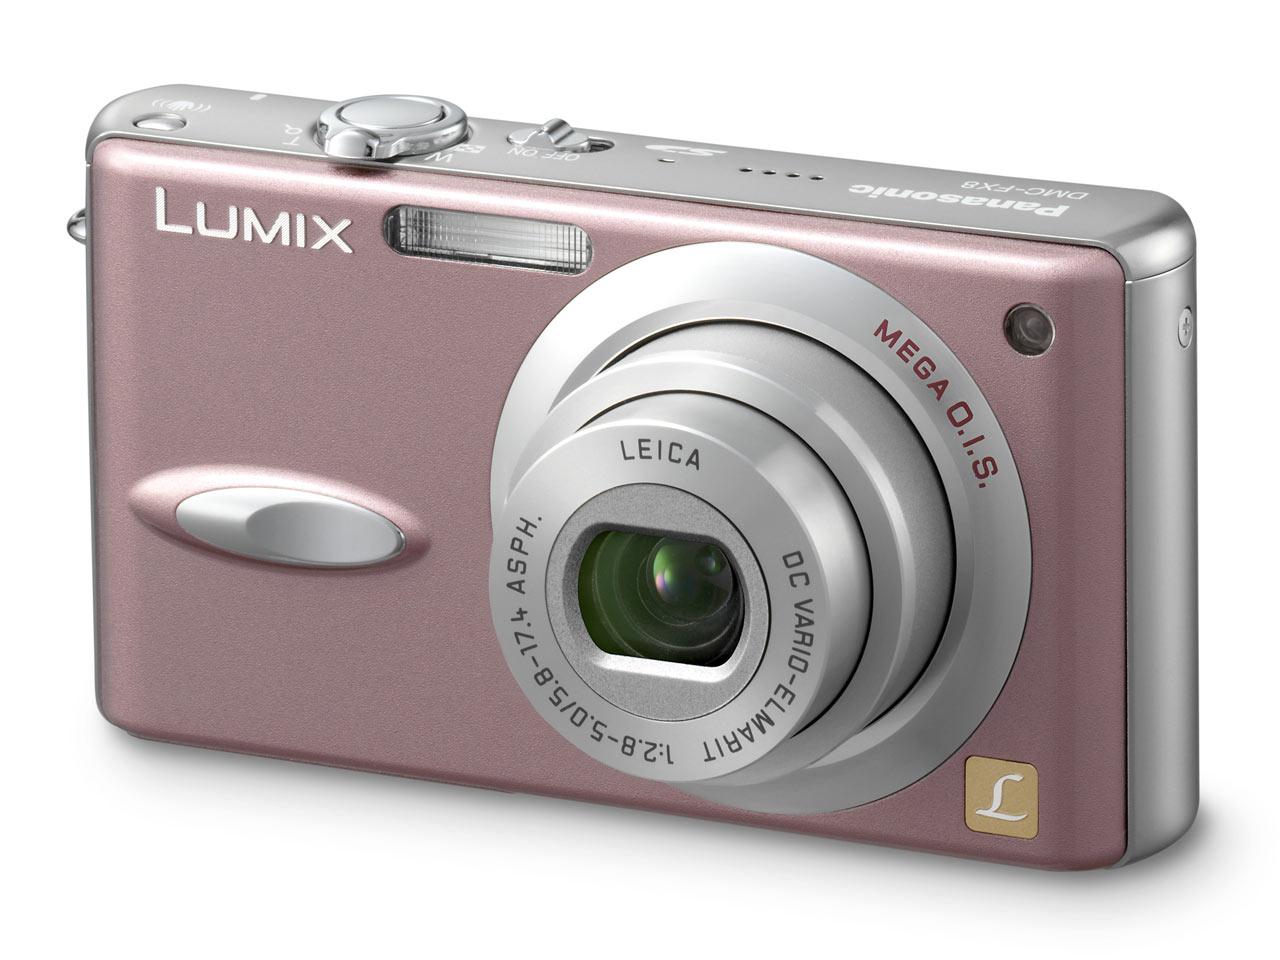 f0283445bd Panasonic Lumix DMC-FX8  Digital Photography Review